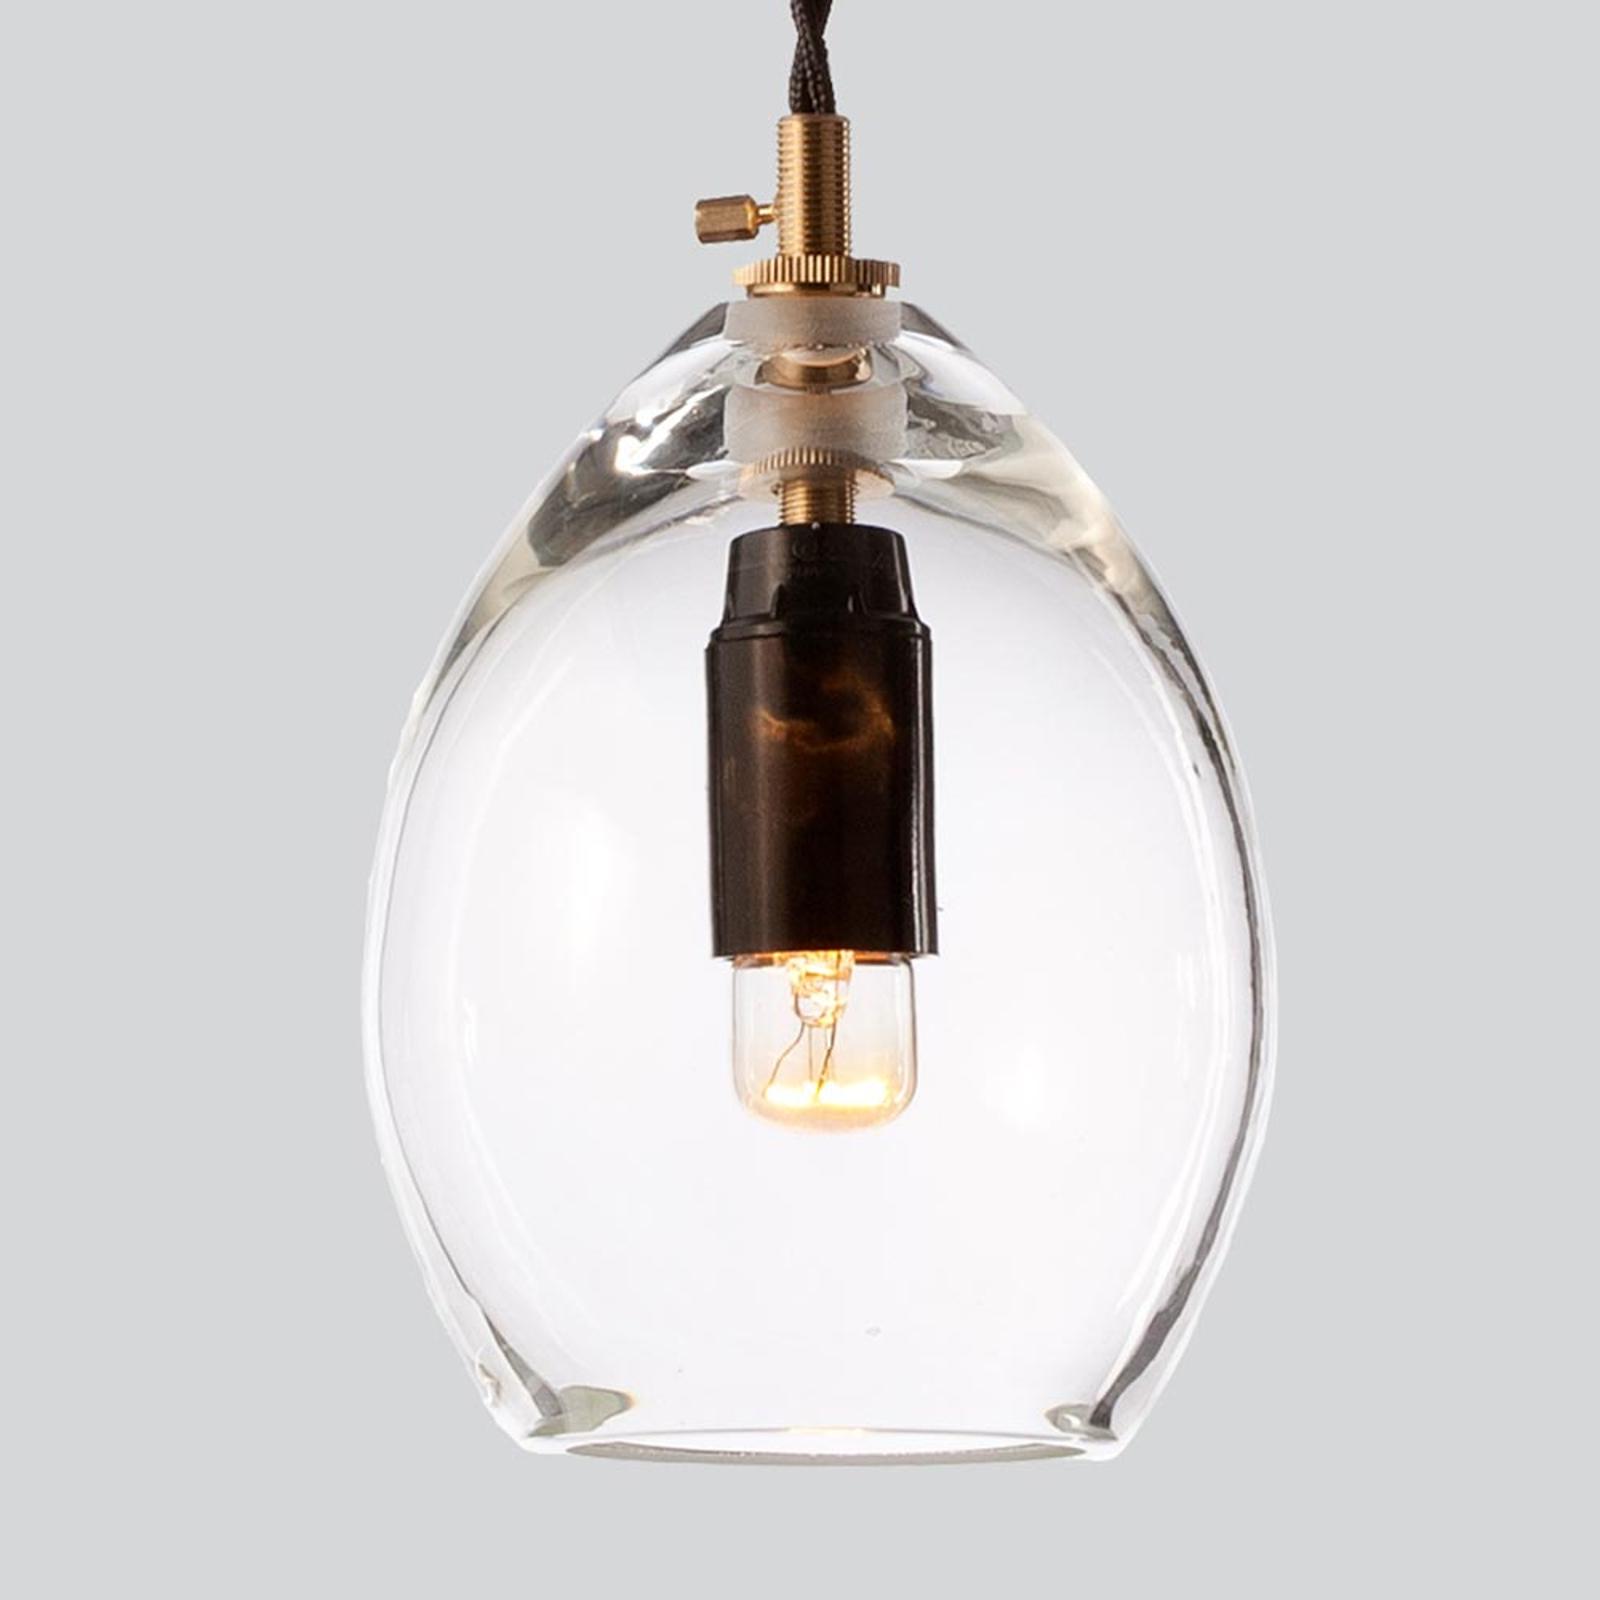 Klar designerpendellampe i glass Unika, 10.5 cm